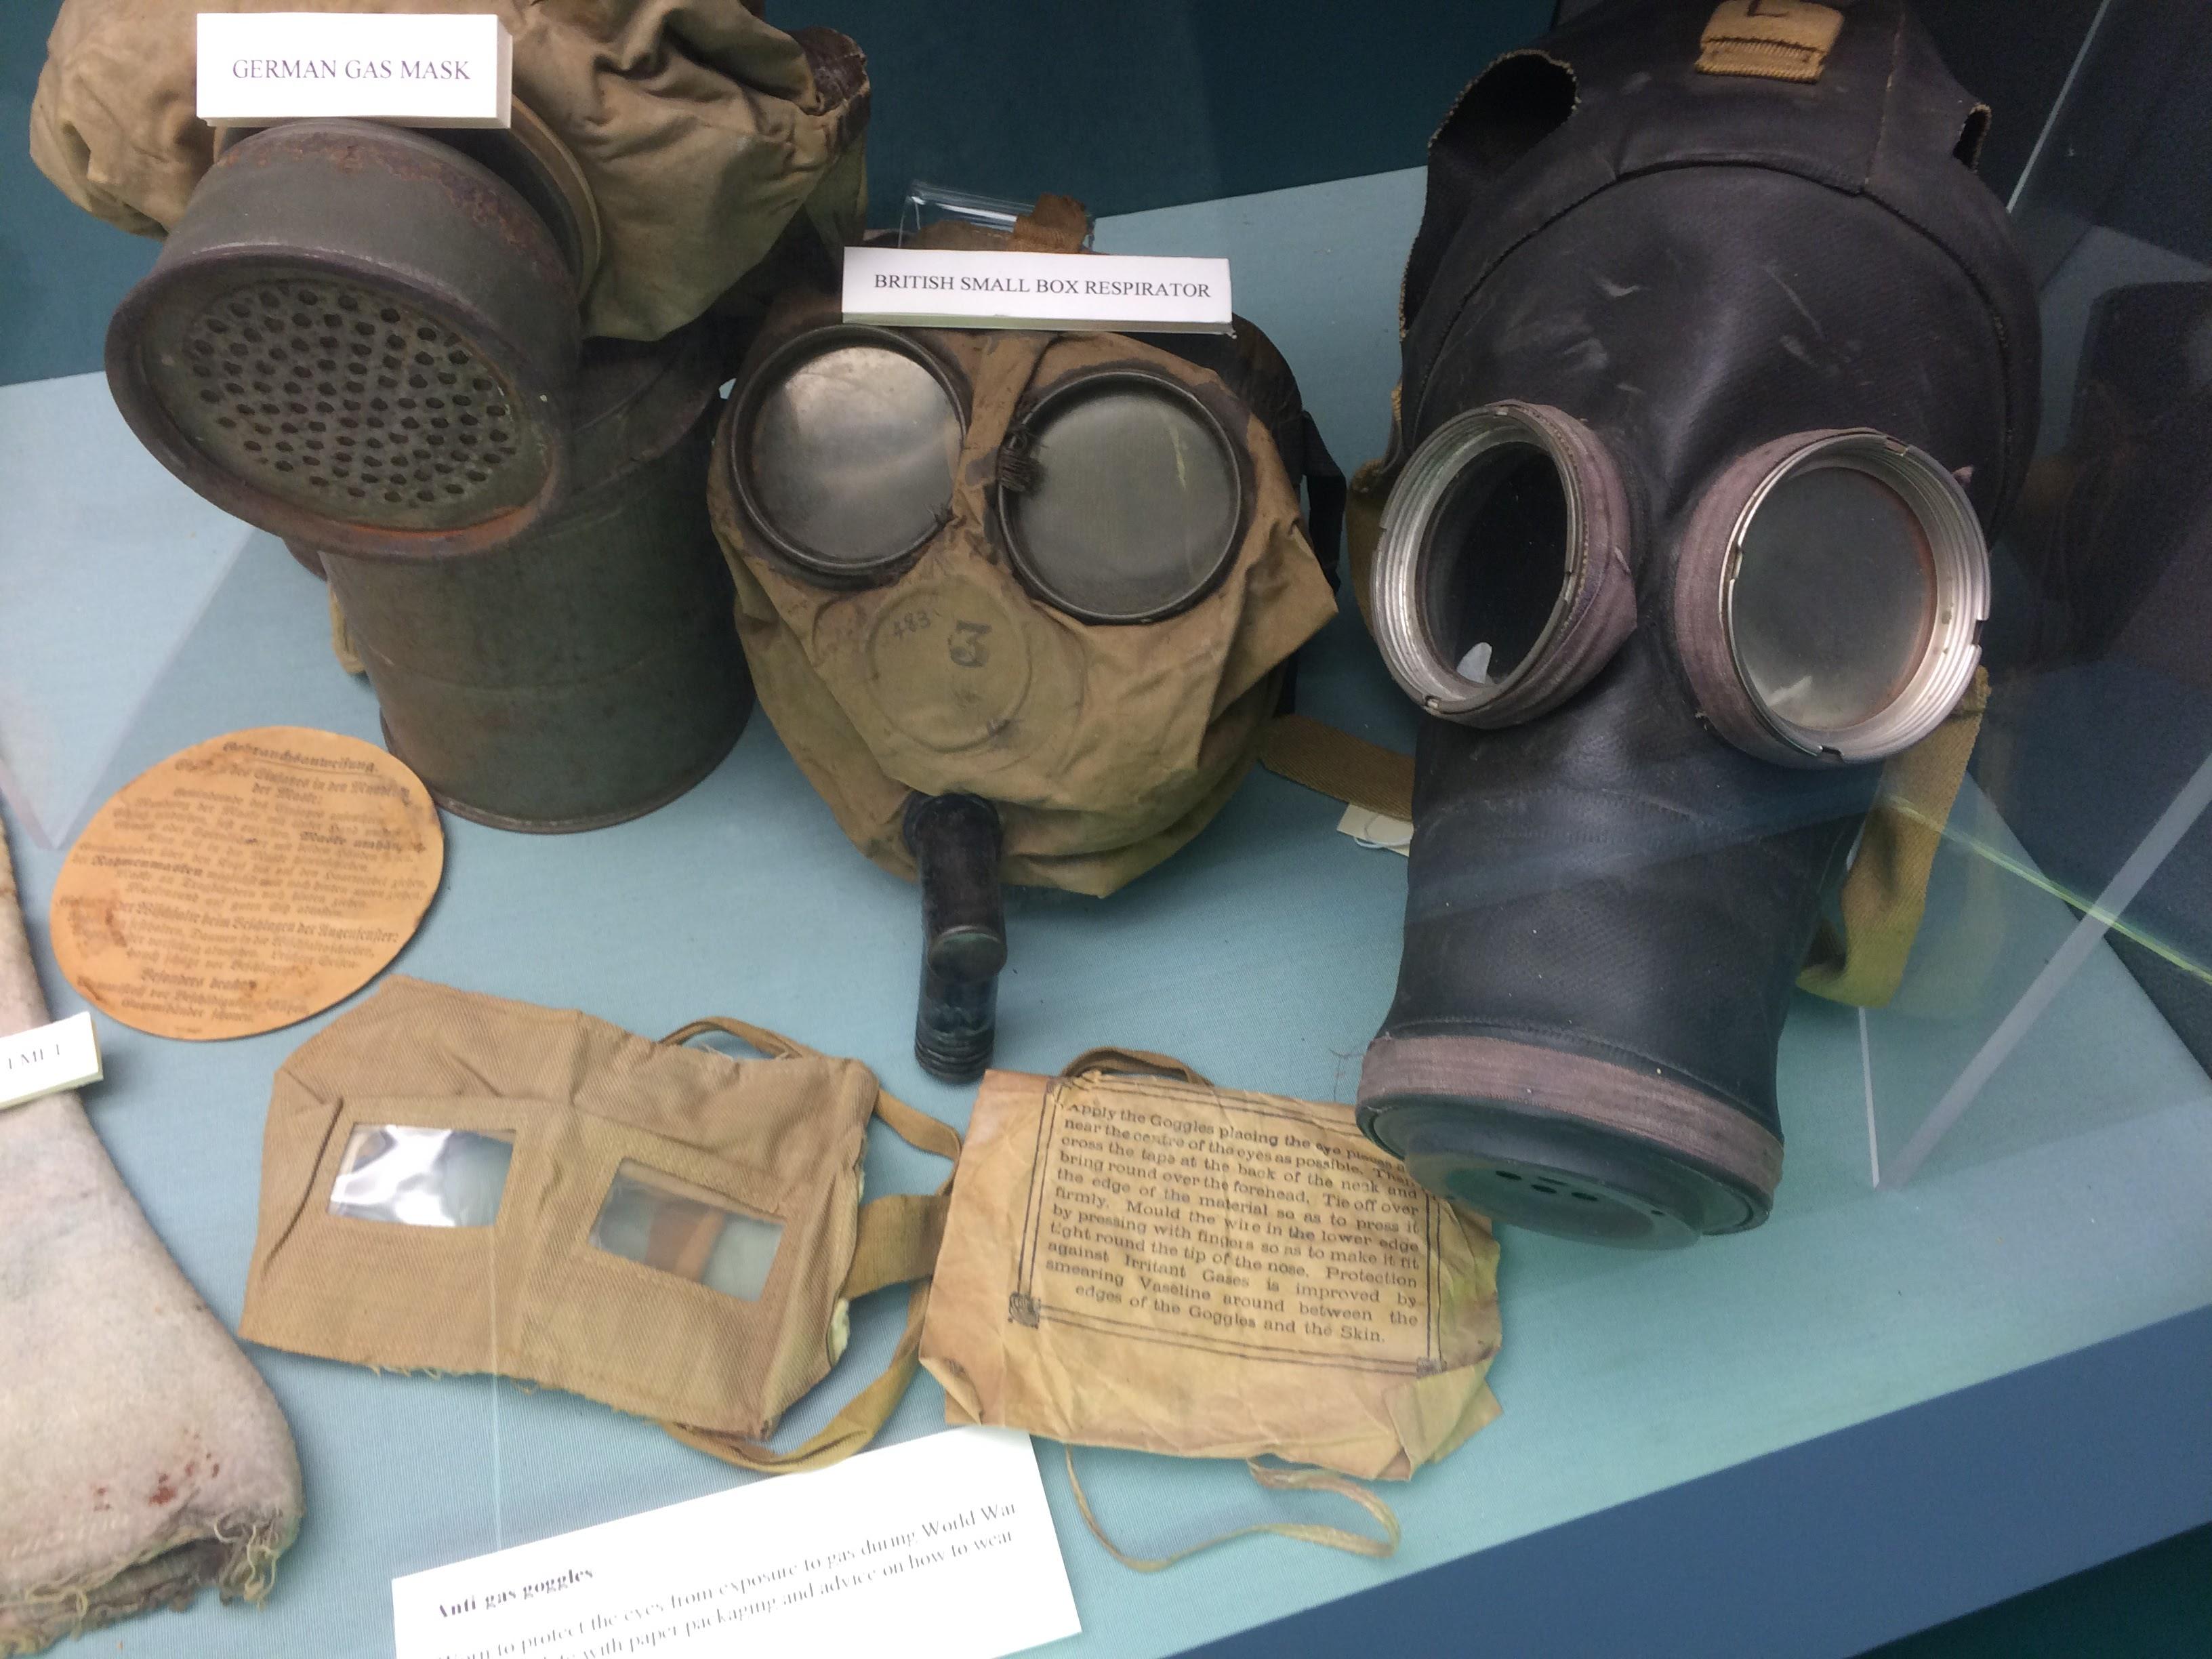 WW1 gas masks